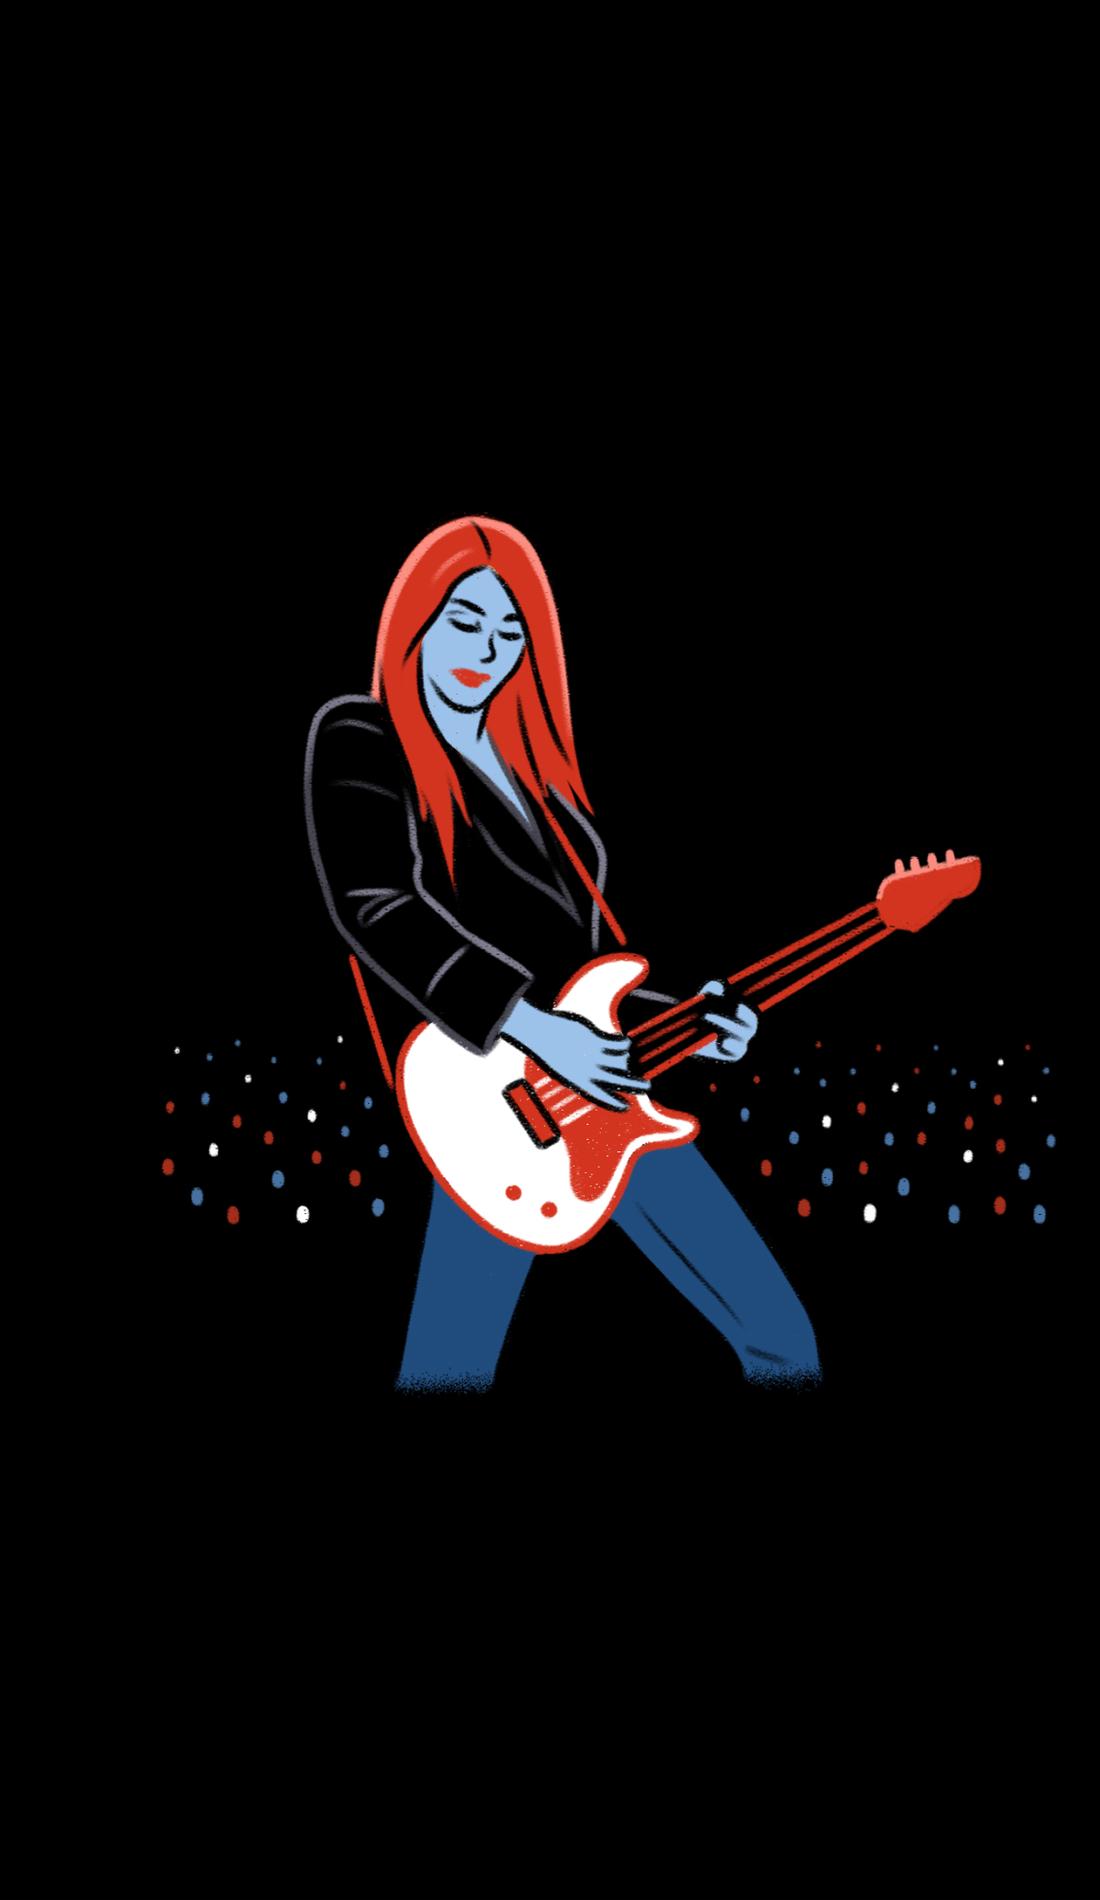 A Technique - New Order Tribute live event